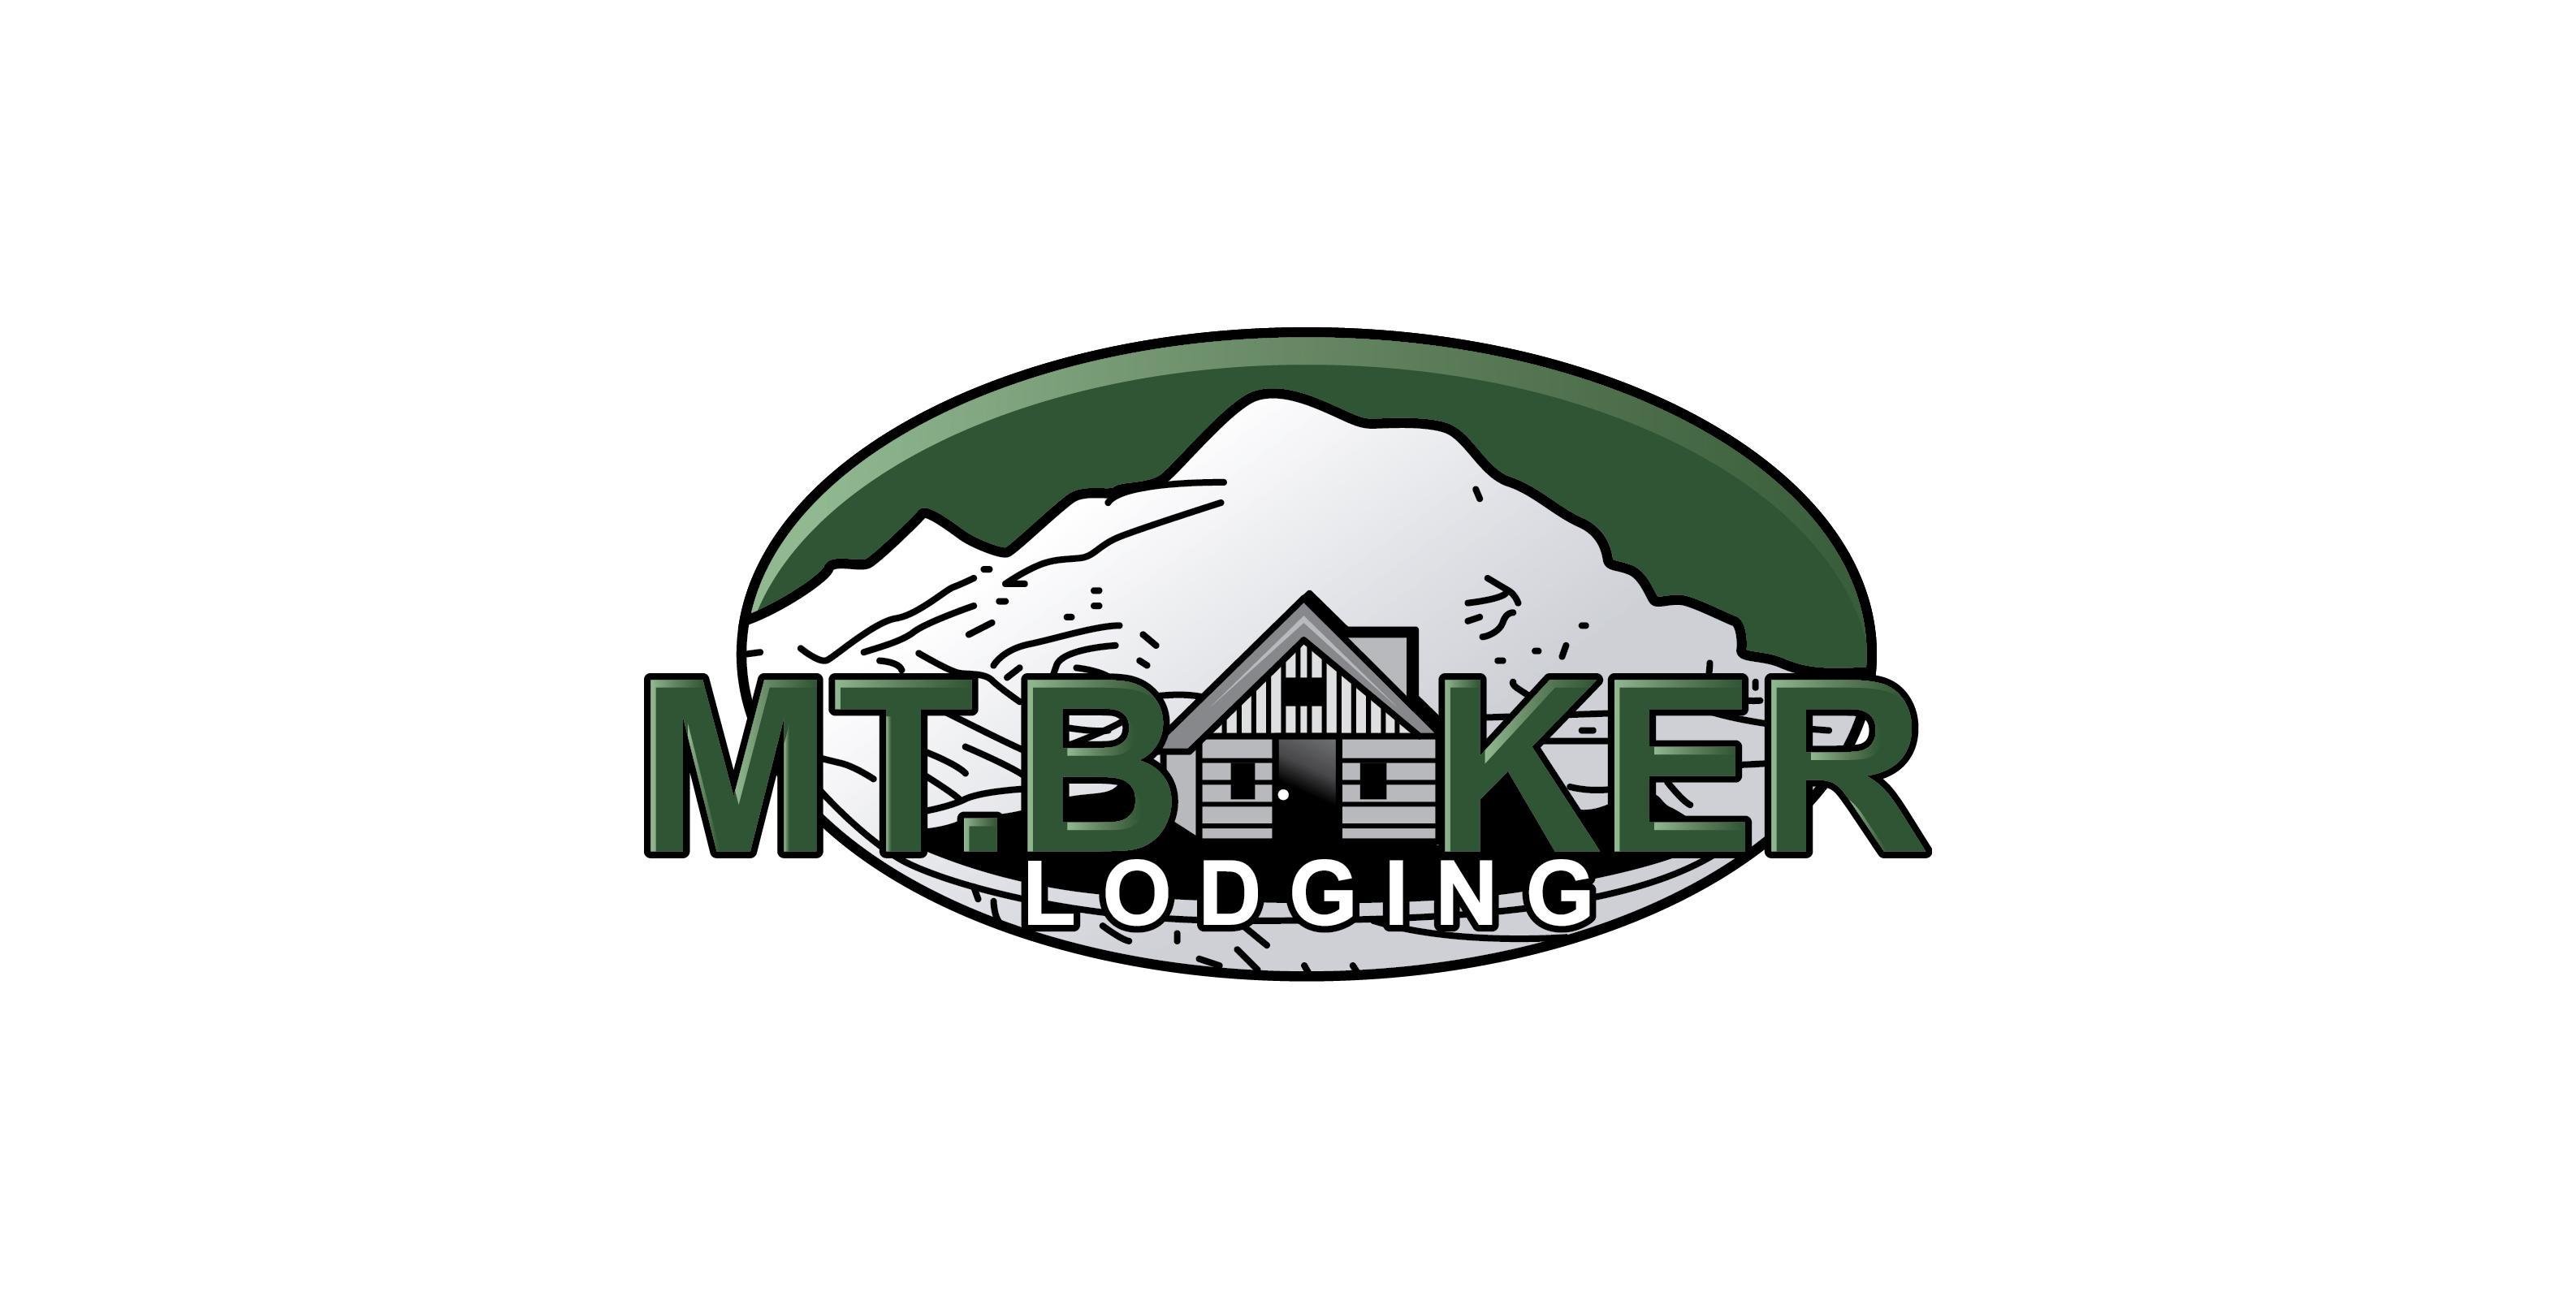 Apartment Mt  Baker Lodging  05  ndash  ECONOMICAL  PET FRIENDLY  WIFI  SLEEPS 2  photo 31816813